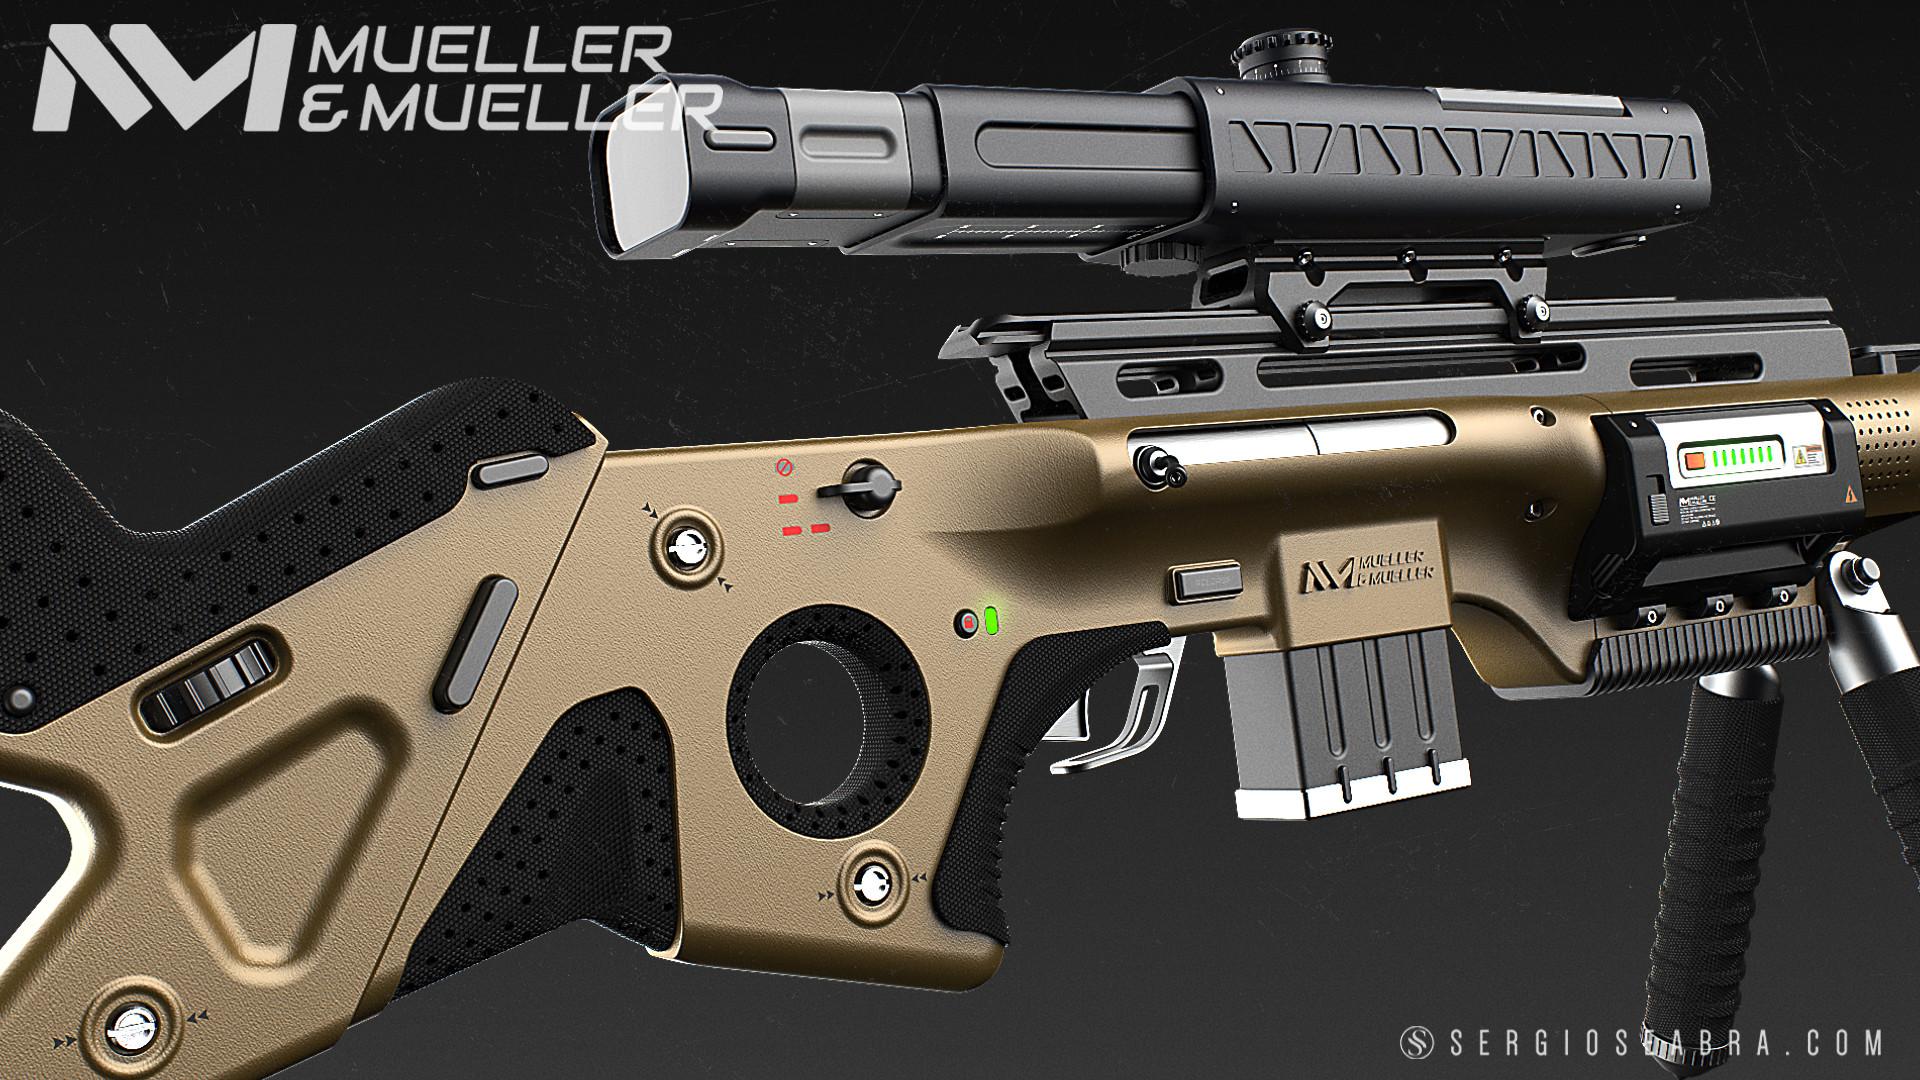 Sergio seabra 20180205 prop phantom twins sniper rifle layouts3